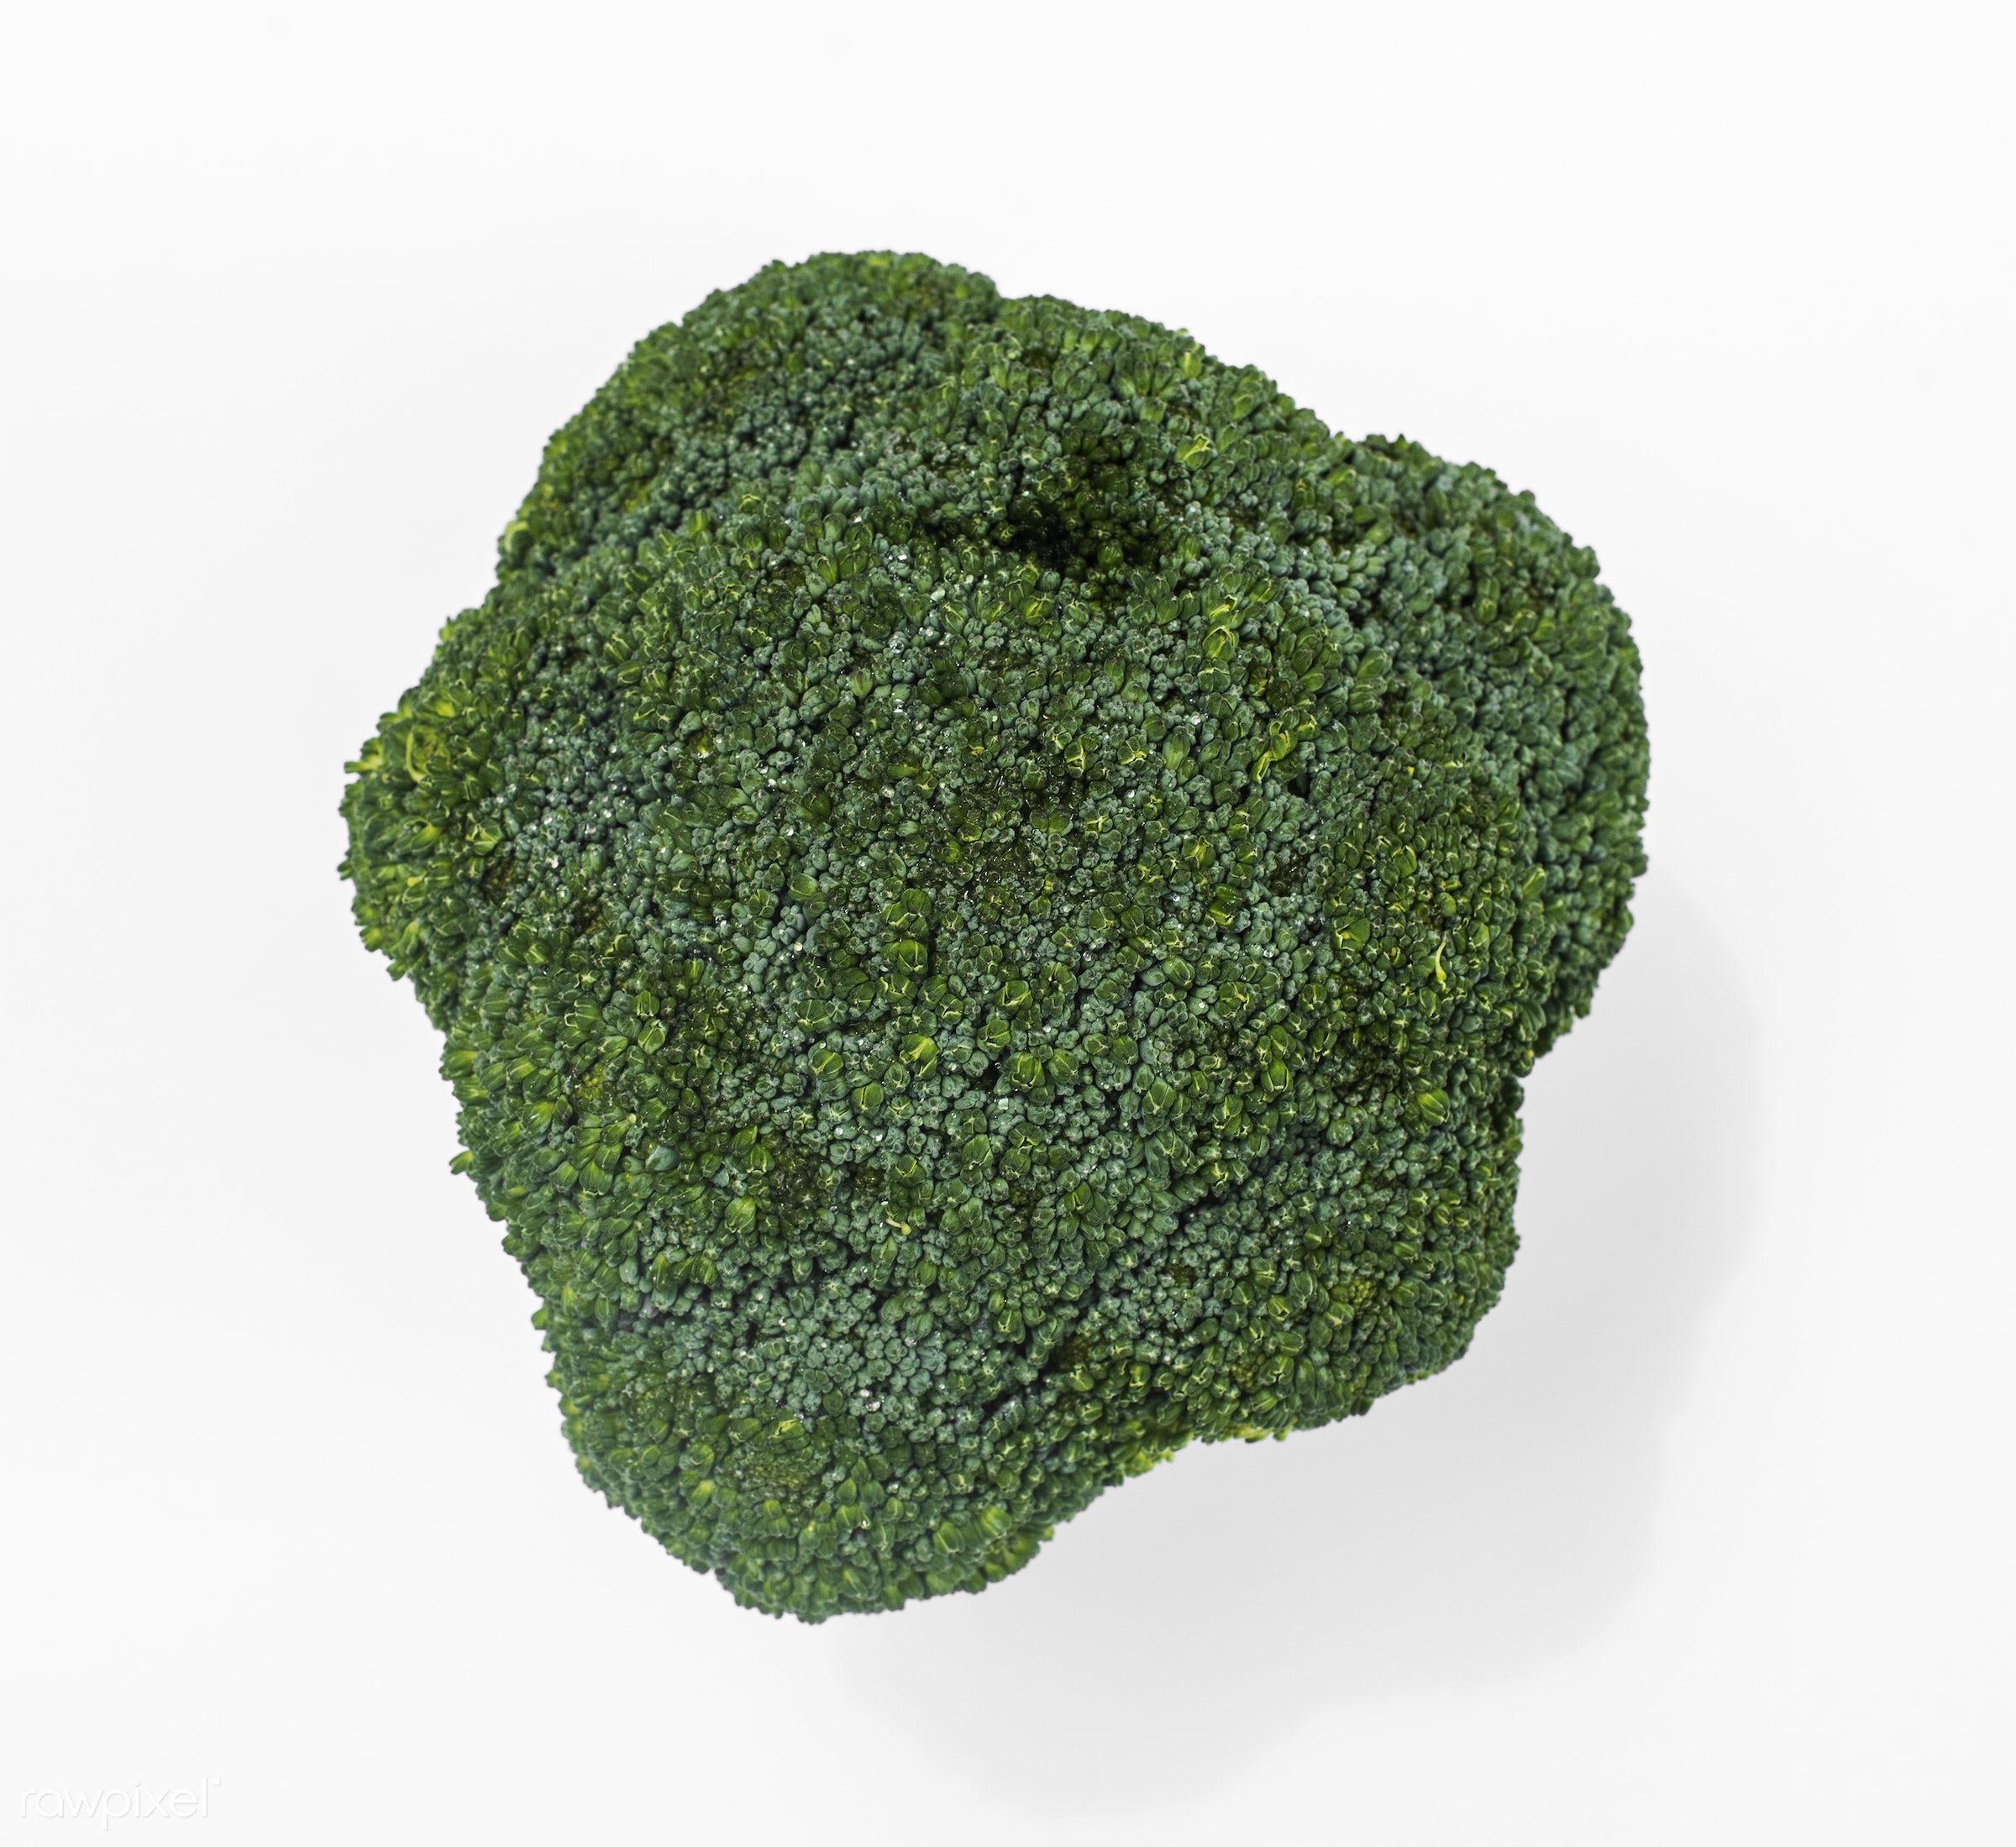 raw, fiber, fresh, broccoli, ingredient, isolated, green, culinary, veggies, edible, nutrition, organic, food, background,...